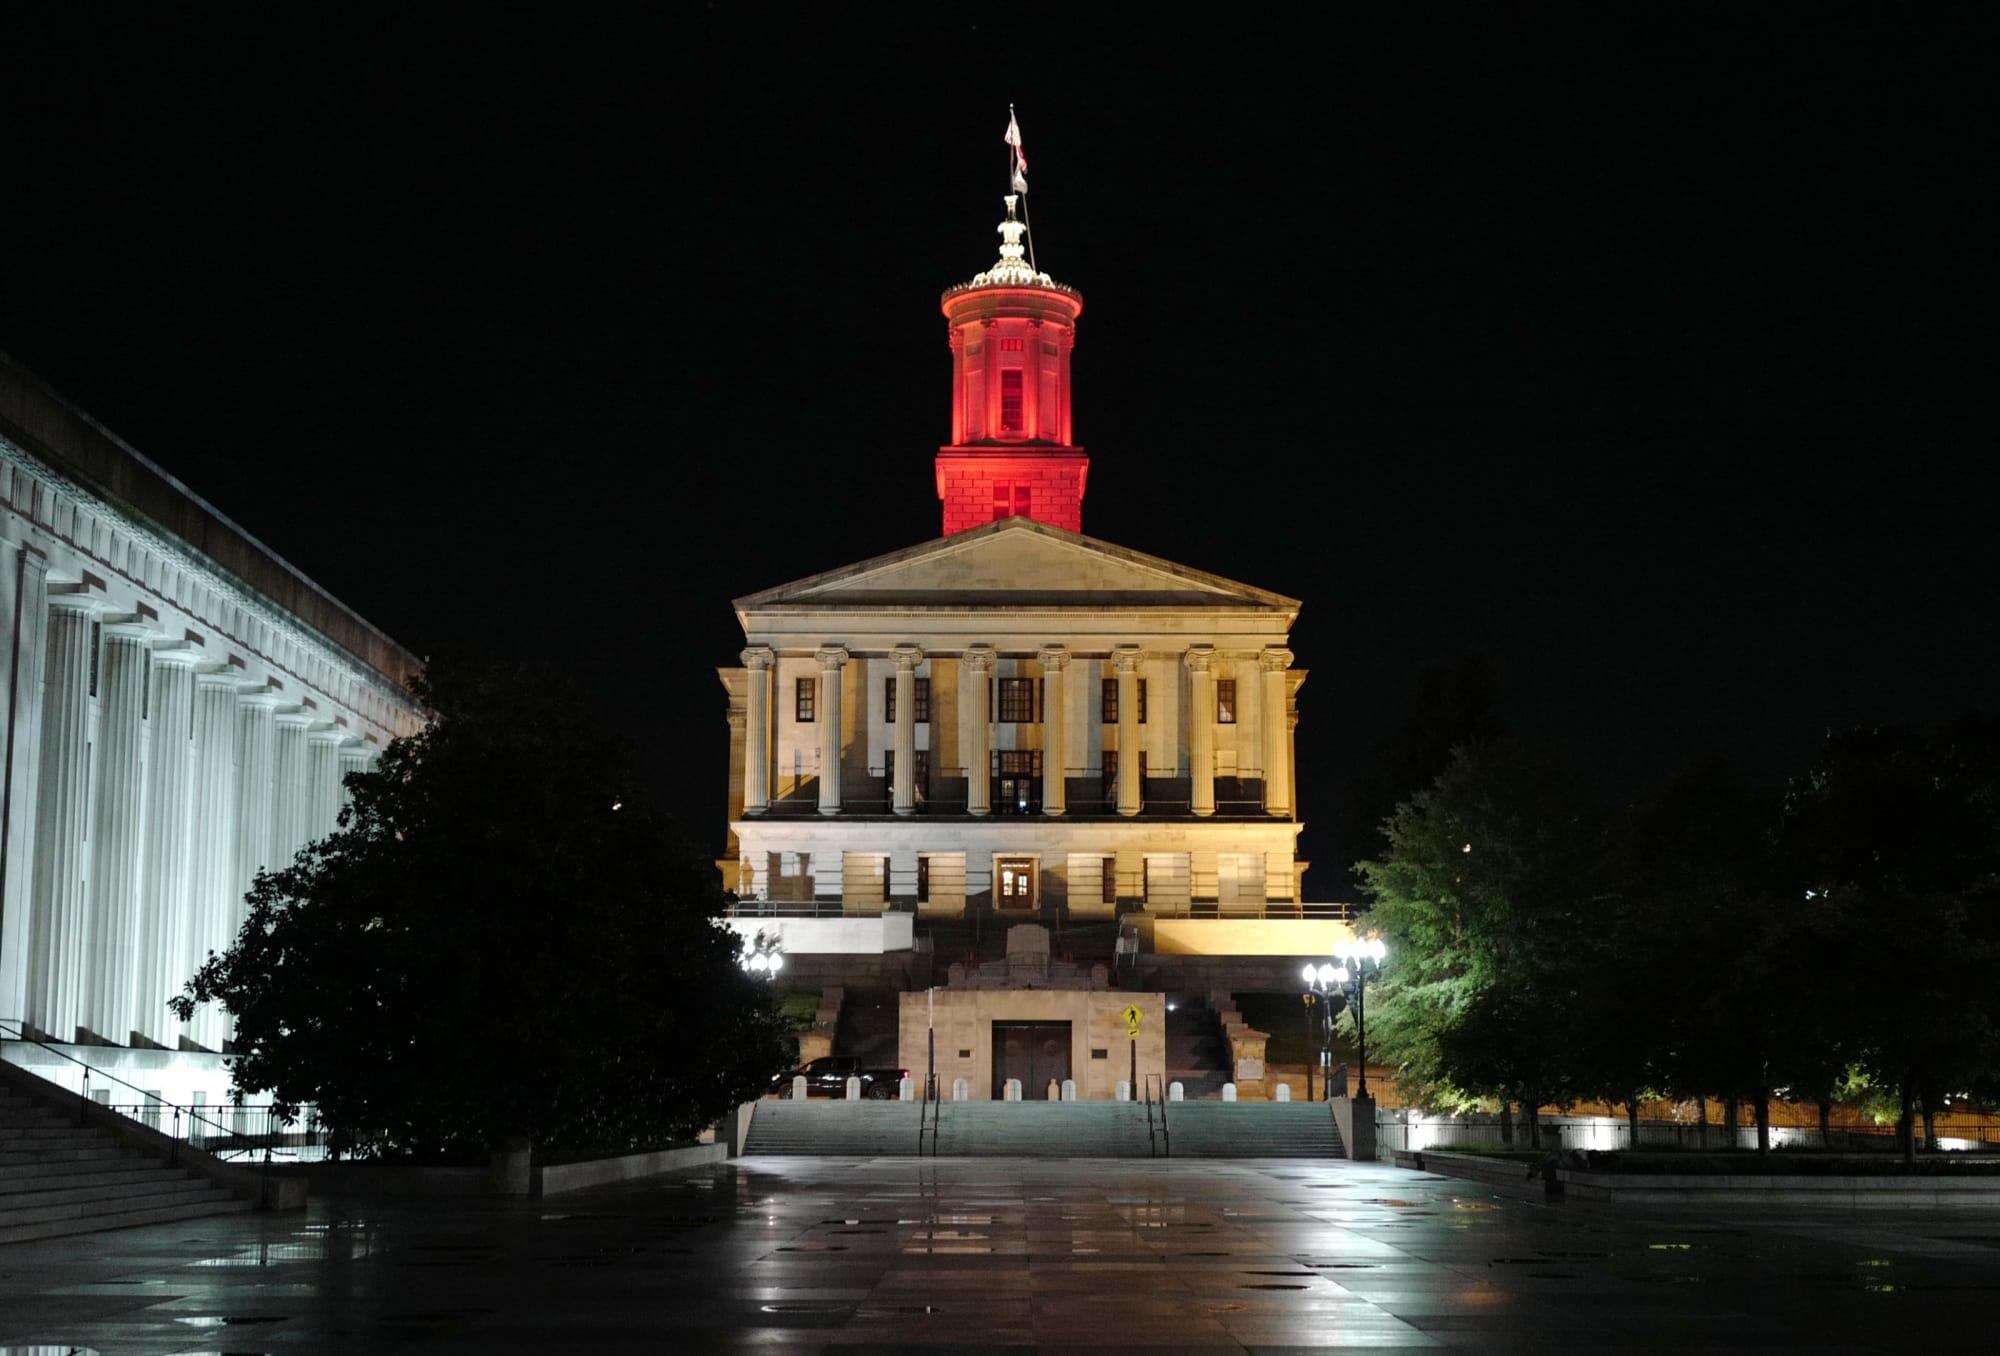 Tennessee football: State senators' anthem stance could wreck program